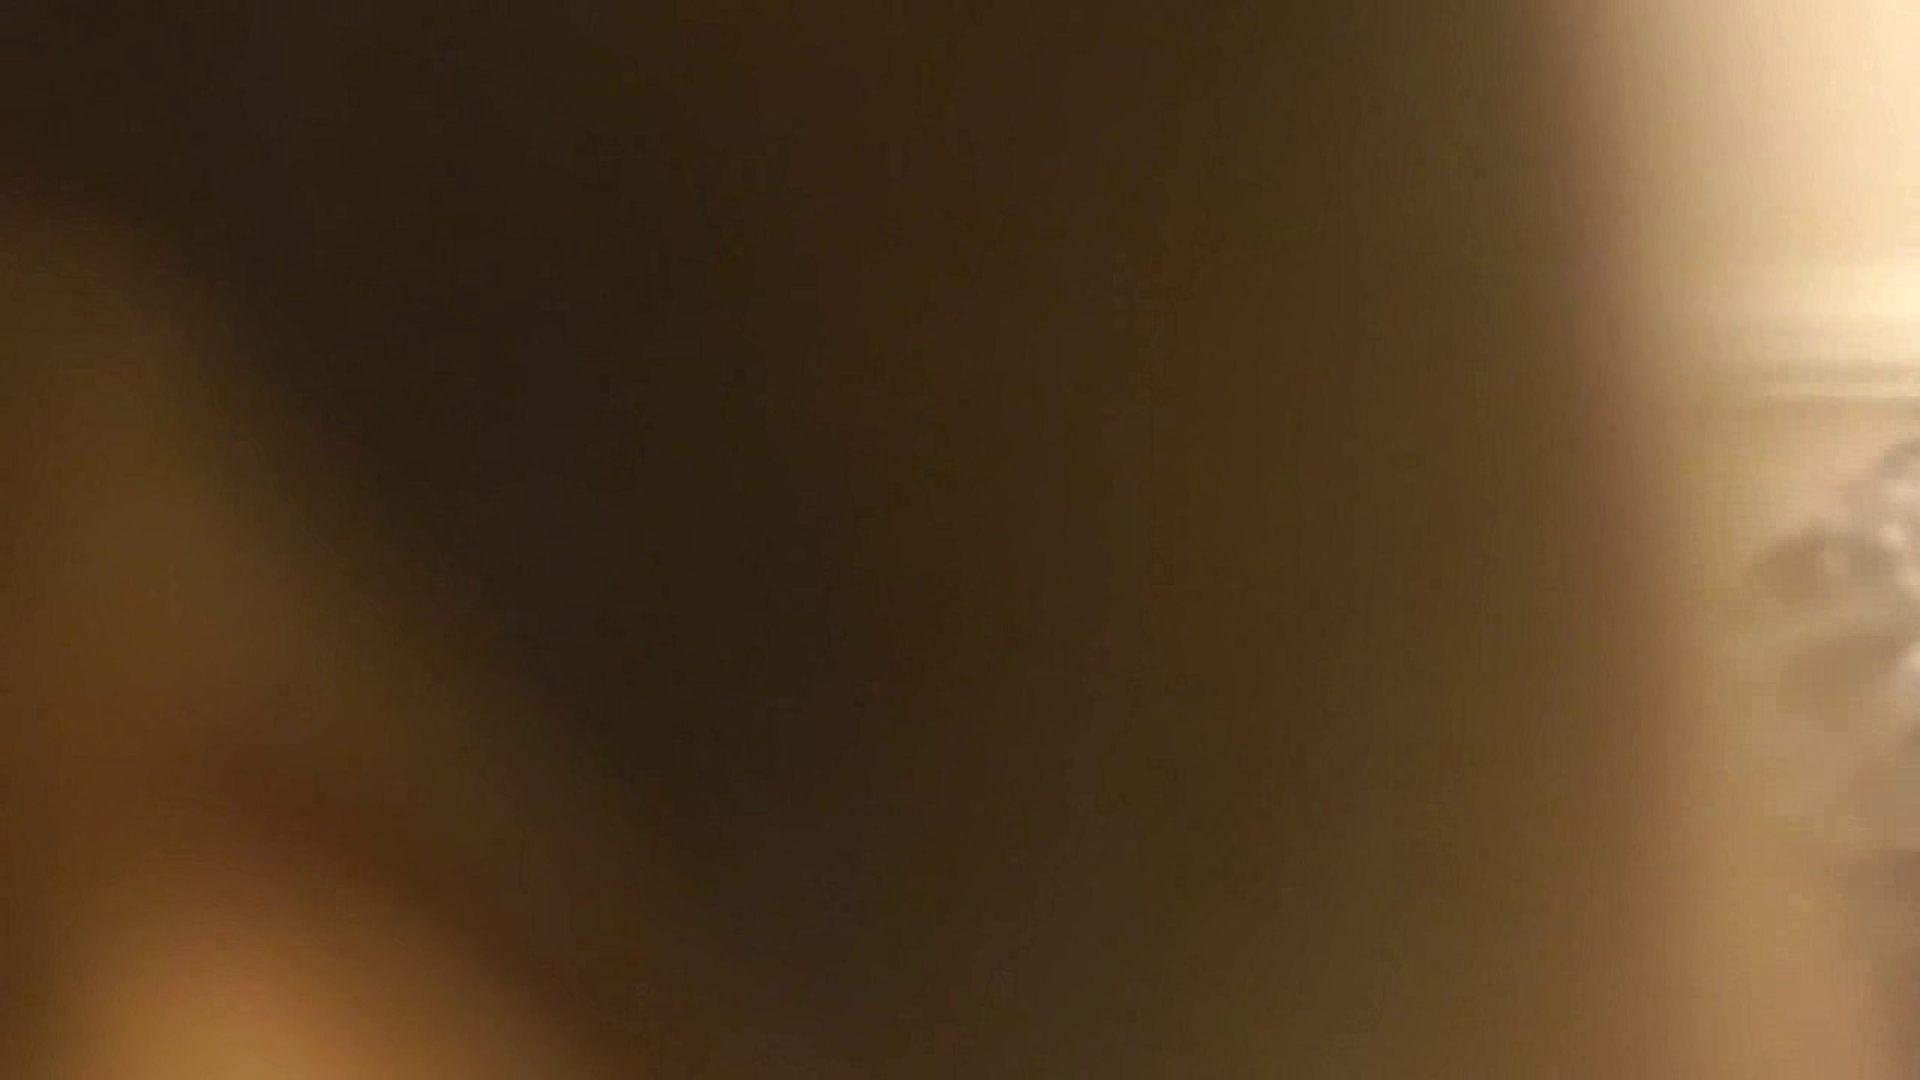 vol.1 Mayumi 窓越しに入浴シーン撮影に成功 入浴中の女性  57PIX 18